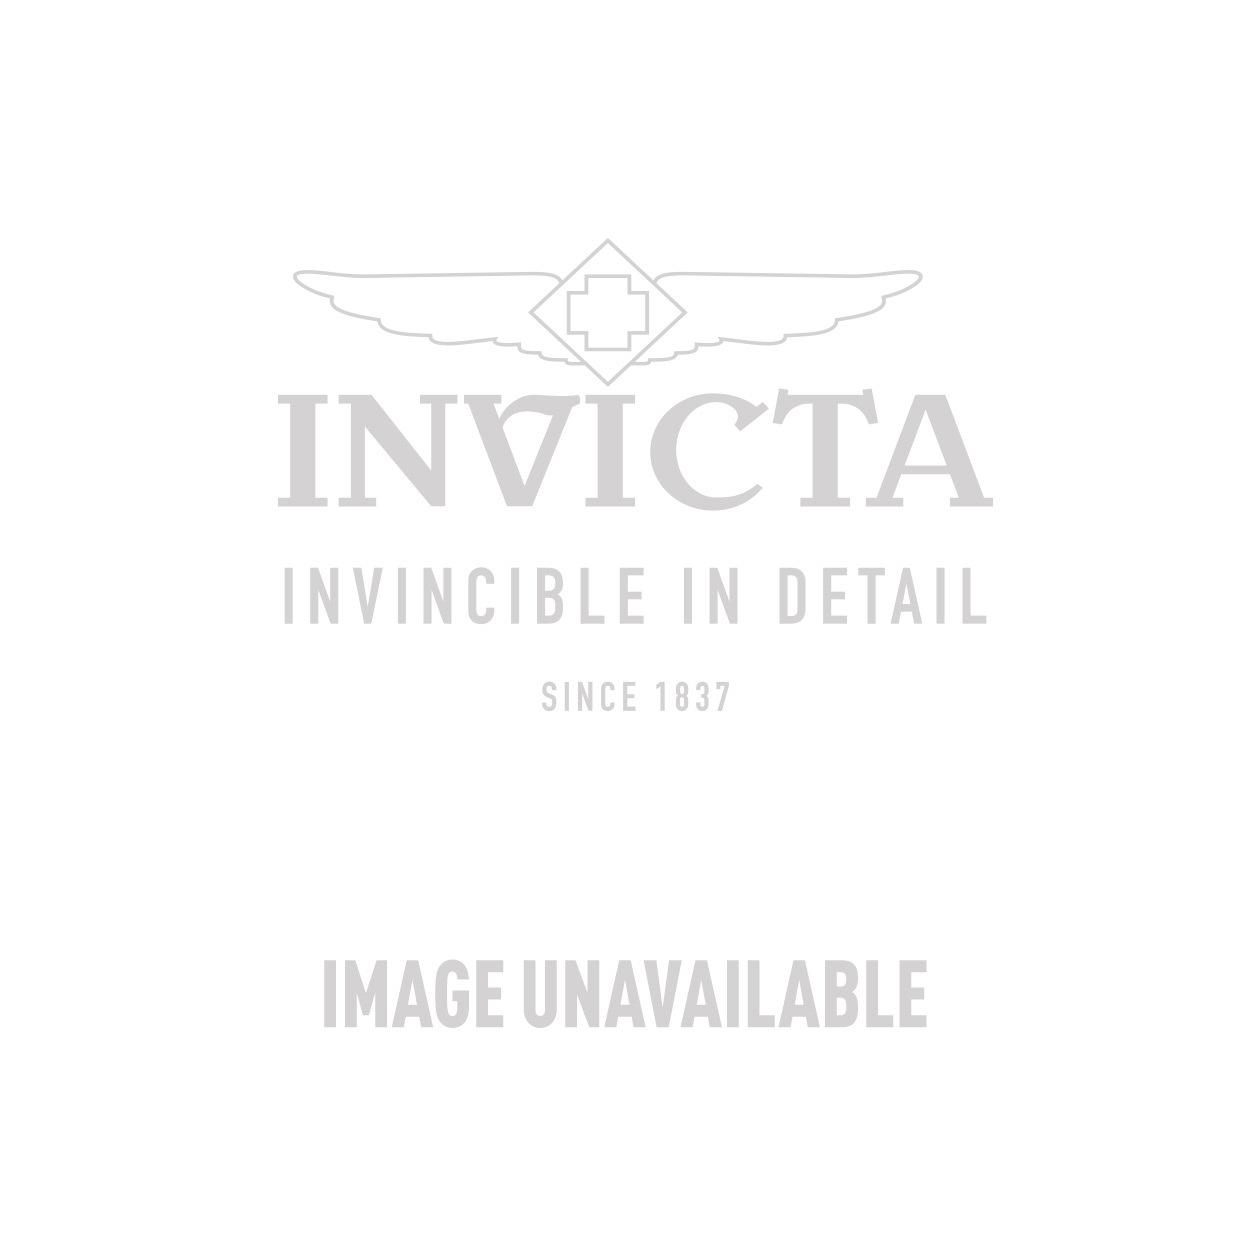 Invicta Corduba Swiss Movement Quartz Watch - Gold case with Gold, Blue tone Stainless Steel, Polyurethane band - Model 6676